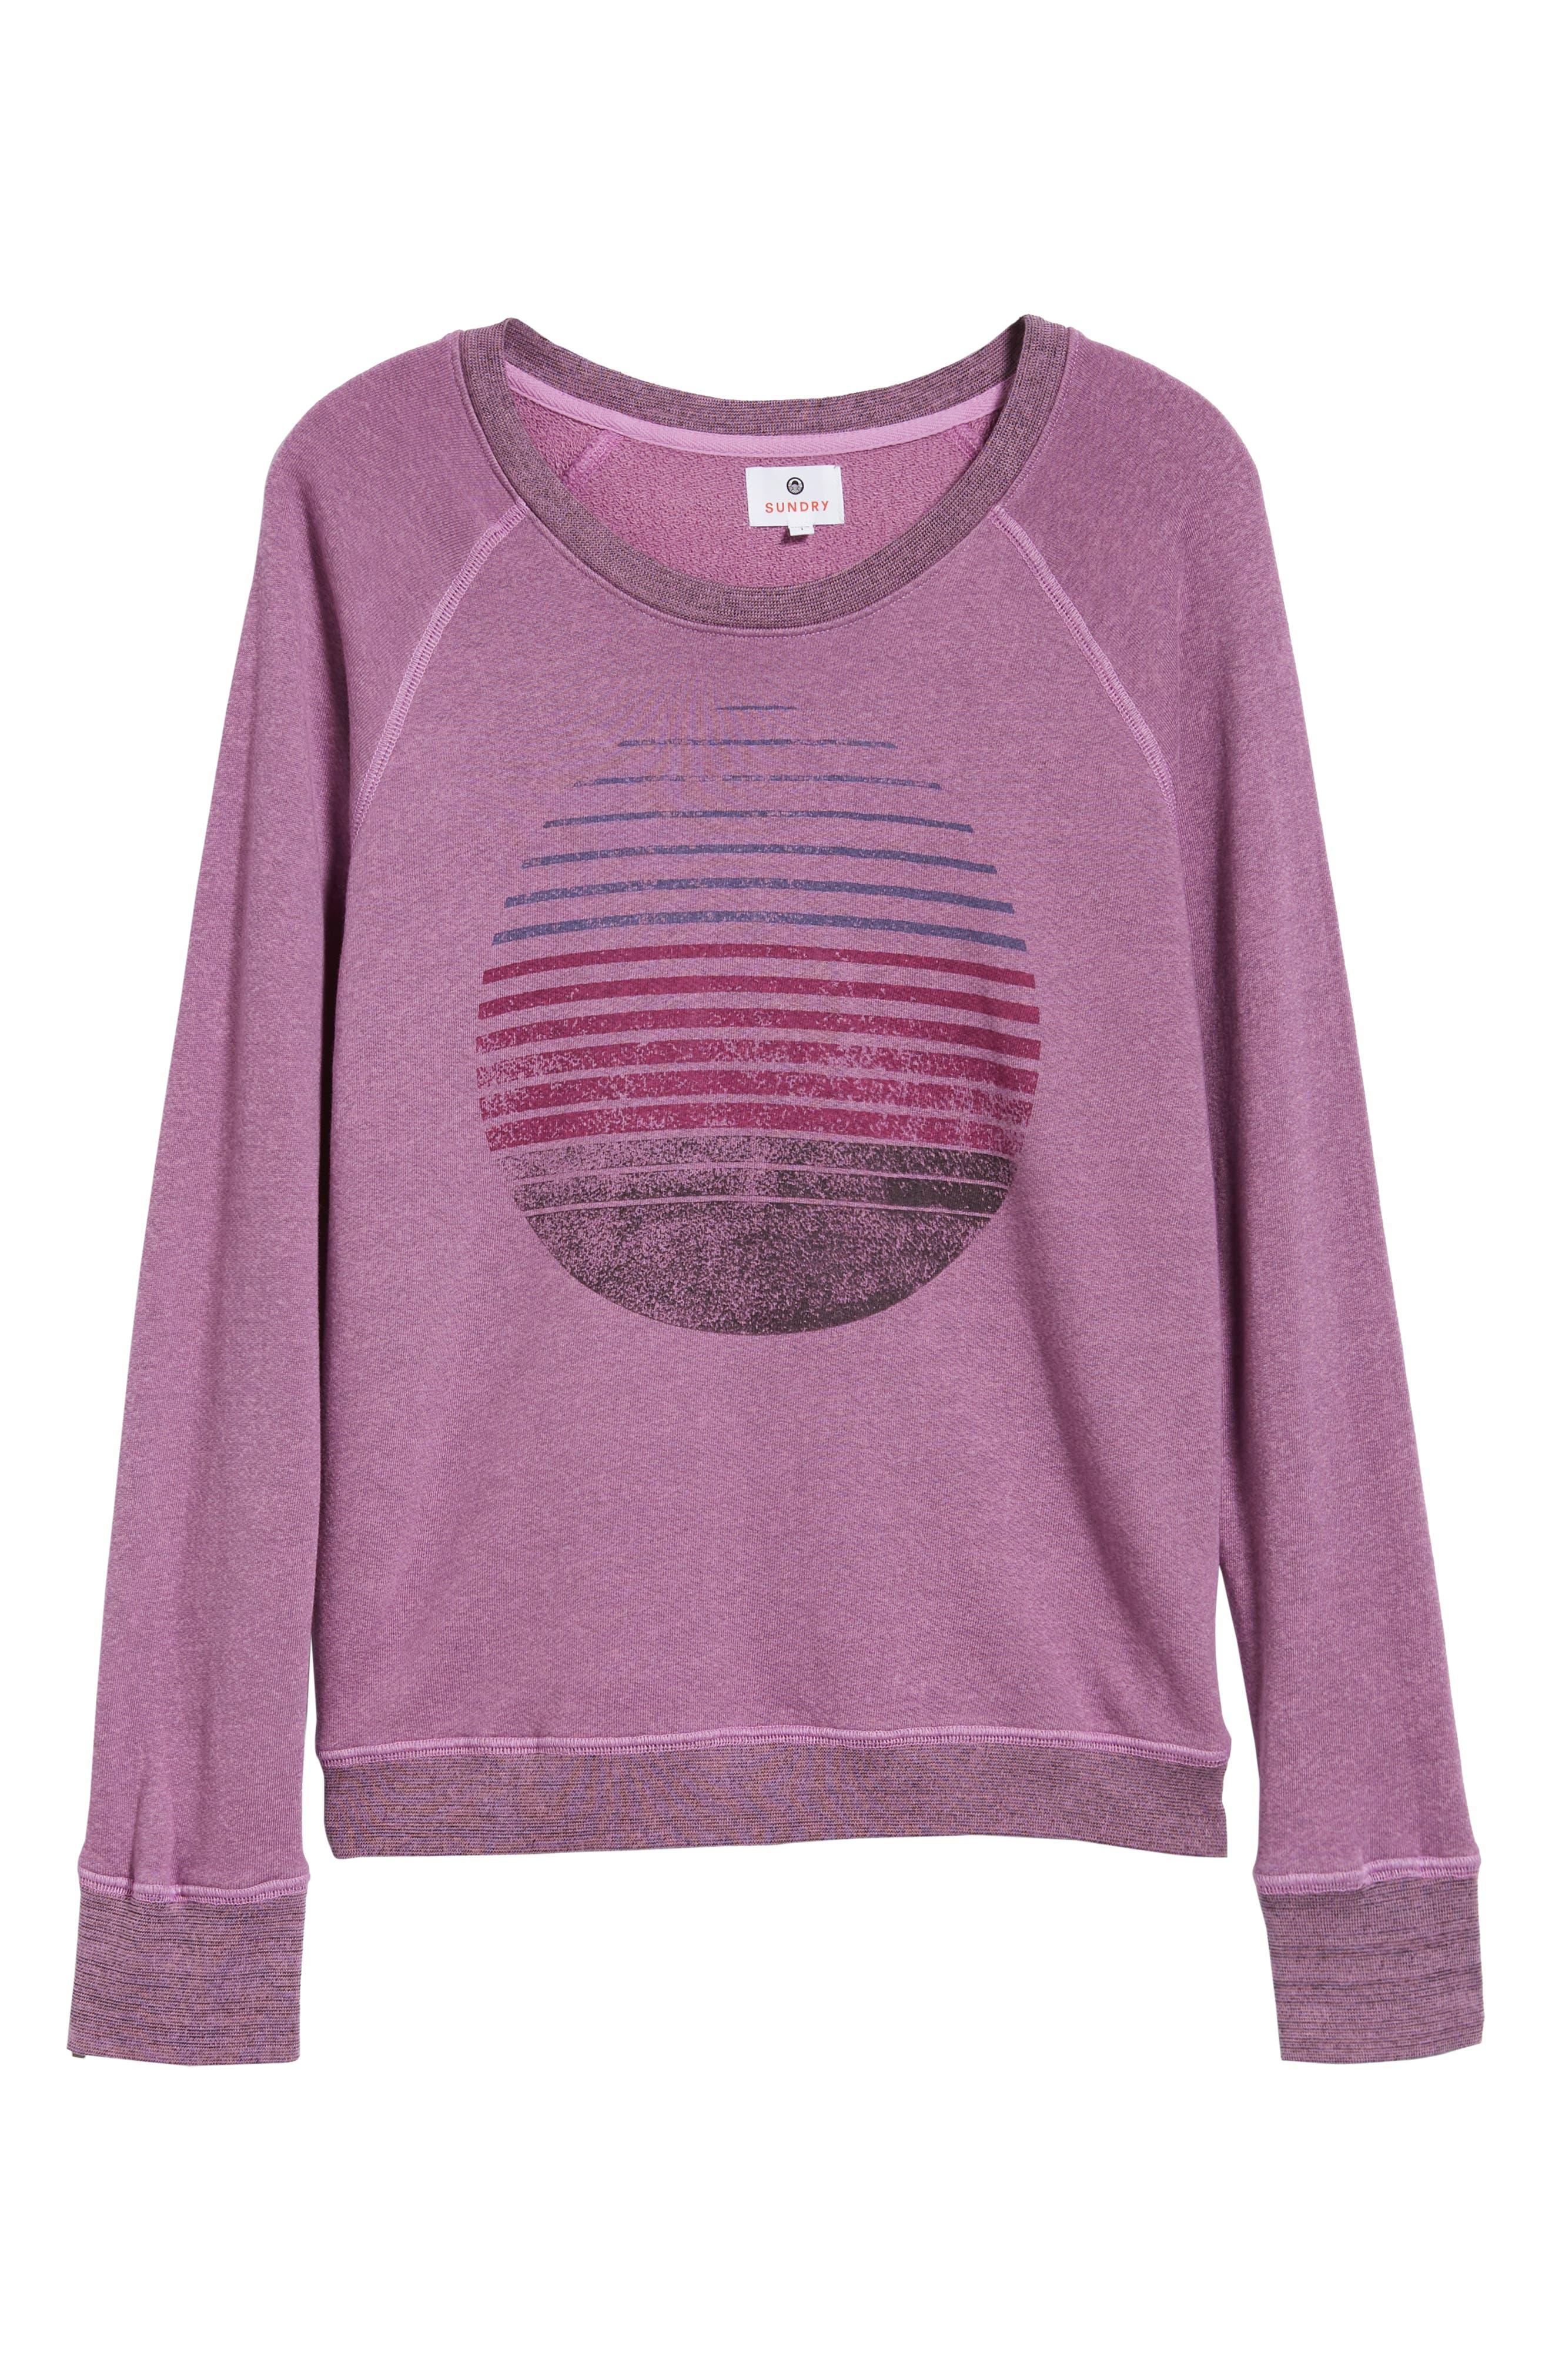 Faded Print Sweatshirt,                             Alternate thumbnail 6, color,                             525